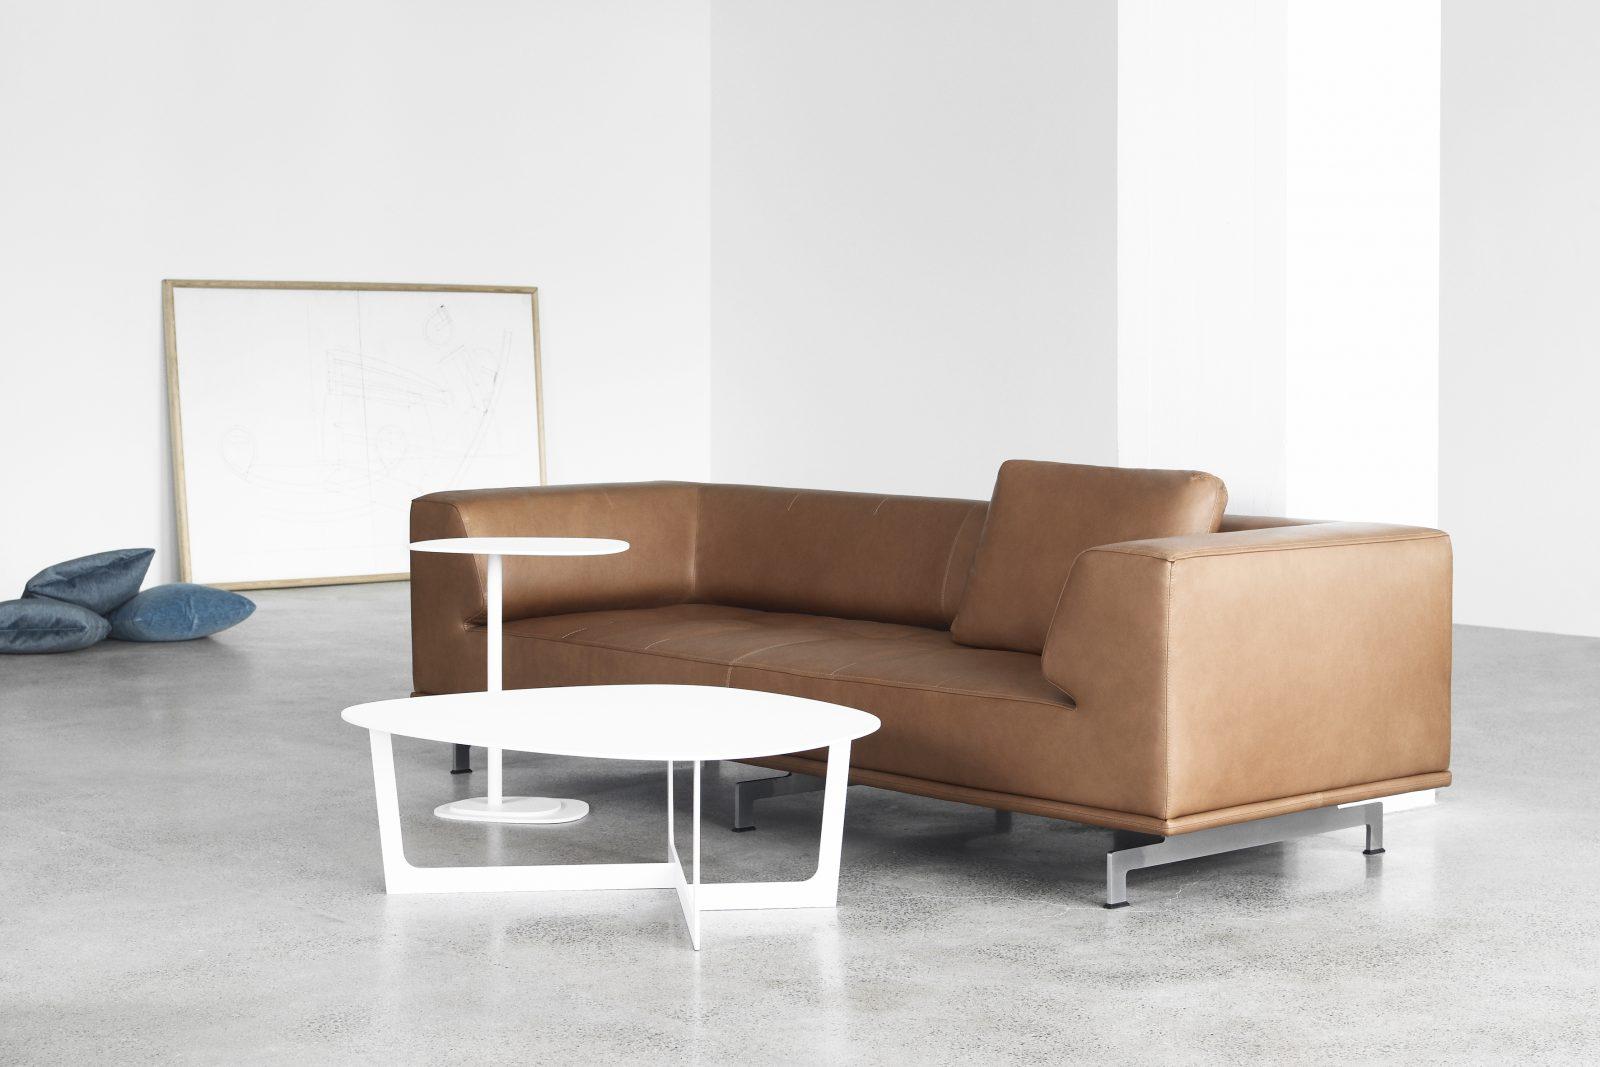 erik j rgensen insula side table nordic urban gmbh. Black Bedroom Furniture Sets. Home Design Ideas